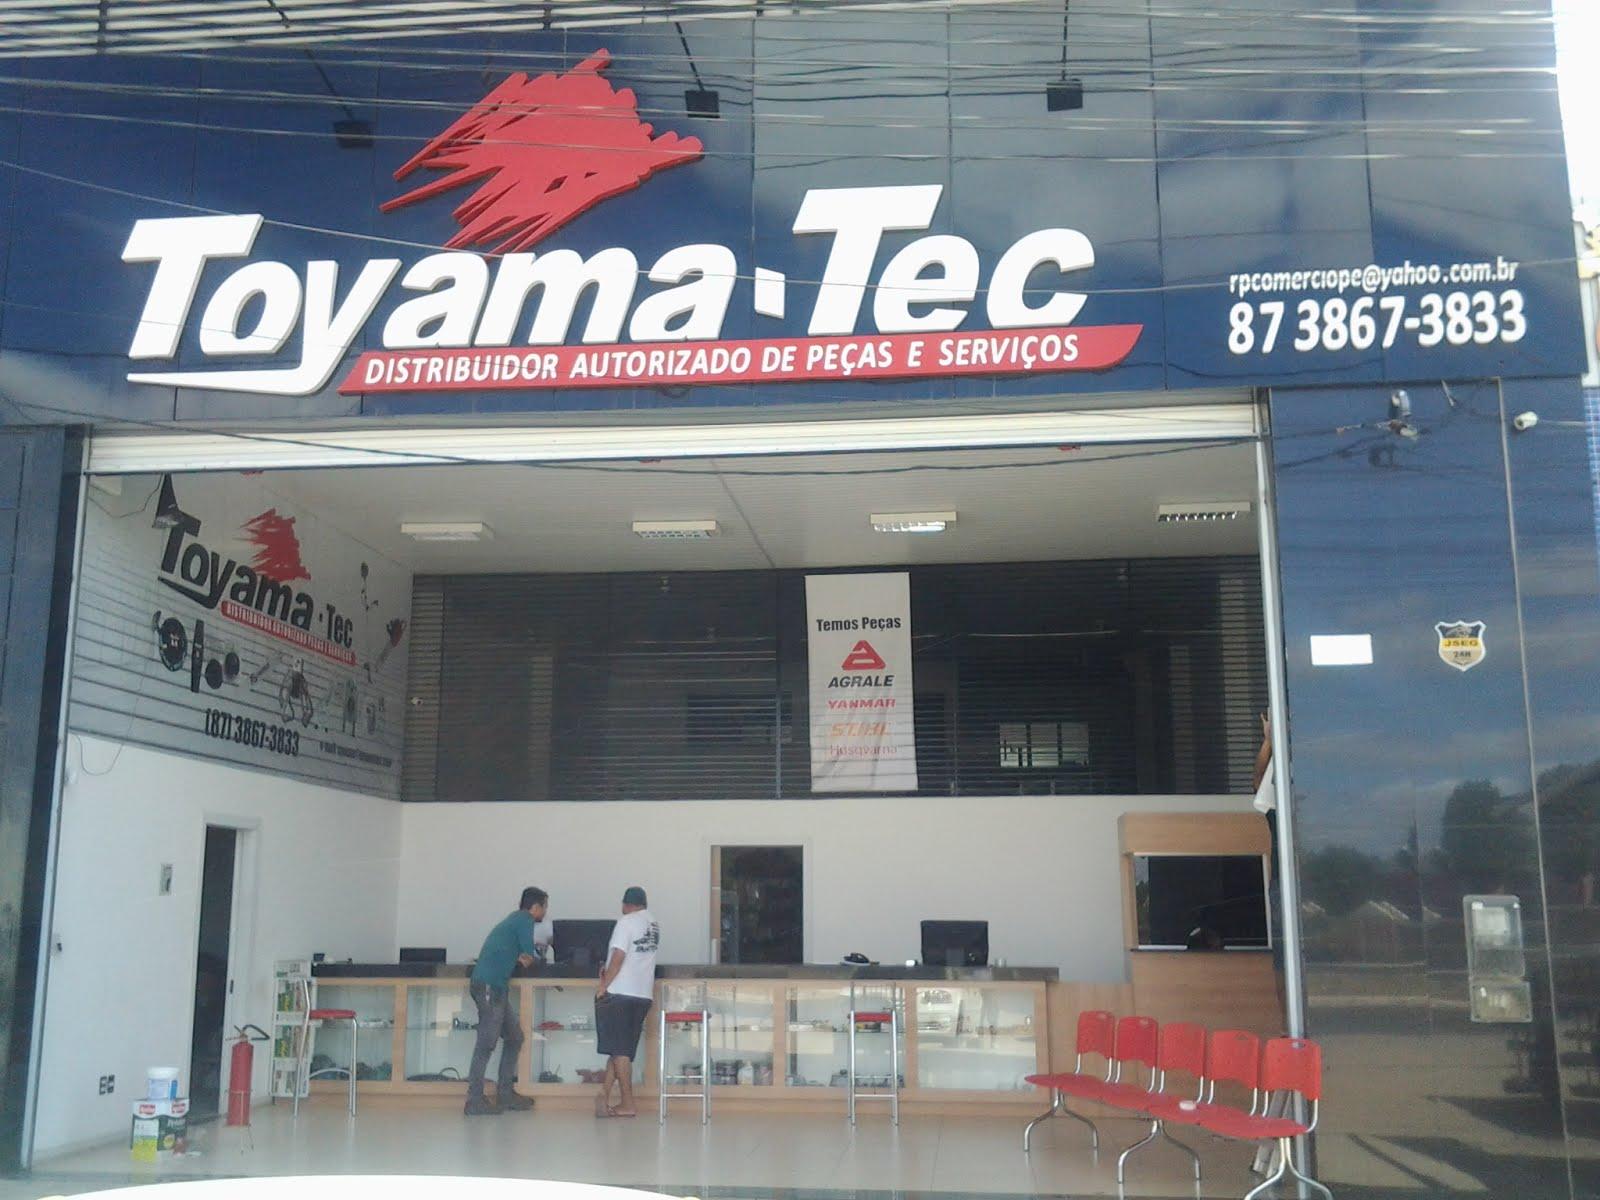 Toyama-Tec Distribuidor autorizado de Peças e Serviços fone 87 3867 3833 Avenida Sete de Setembro-